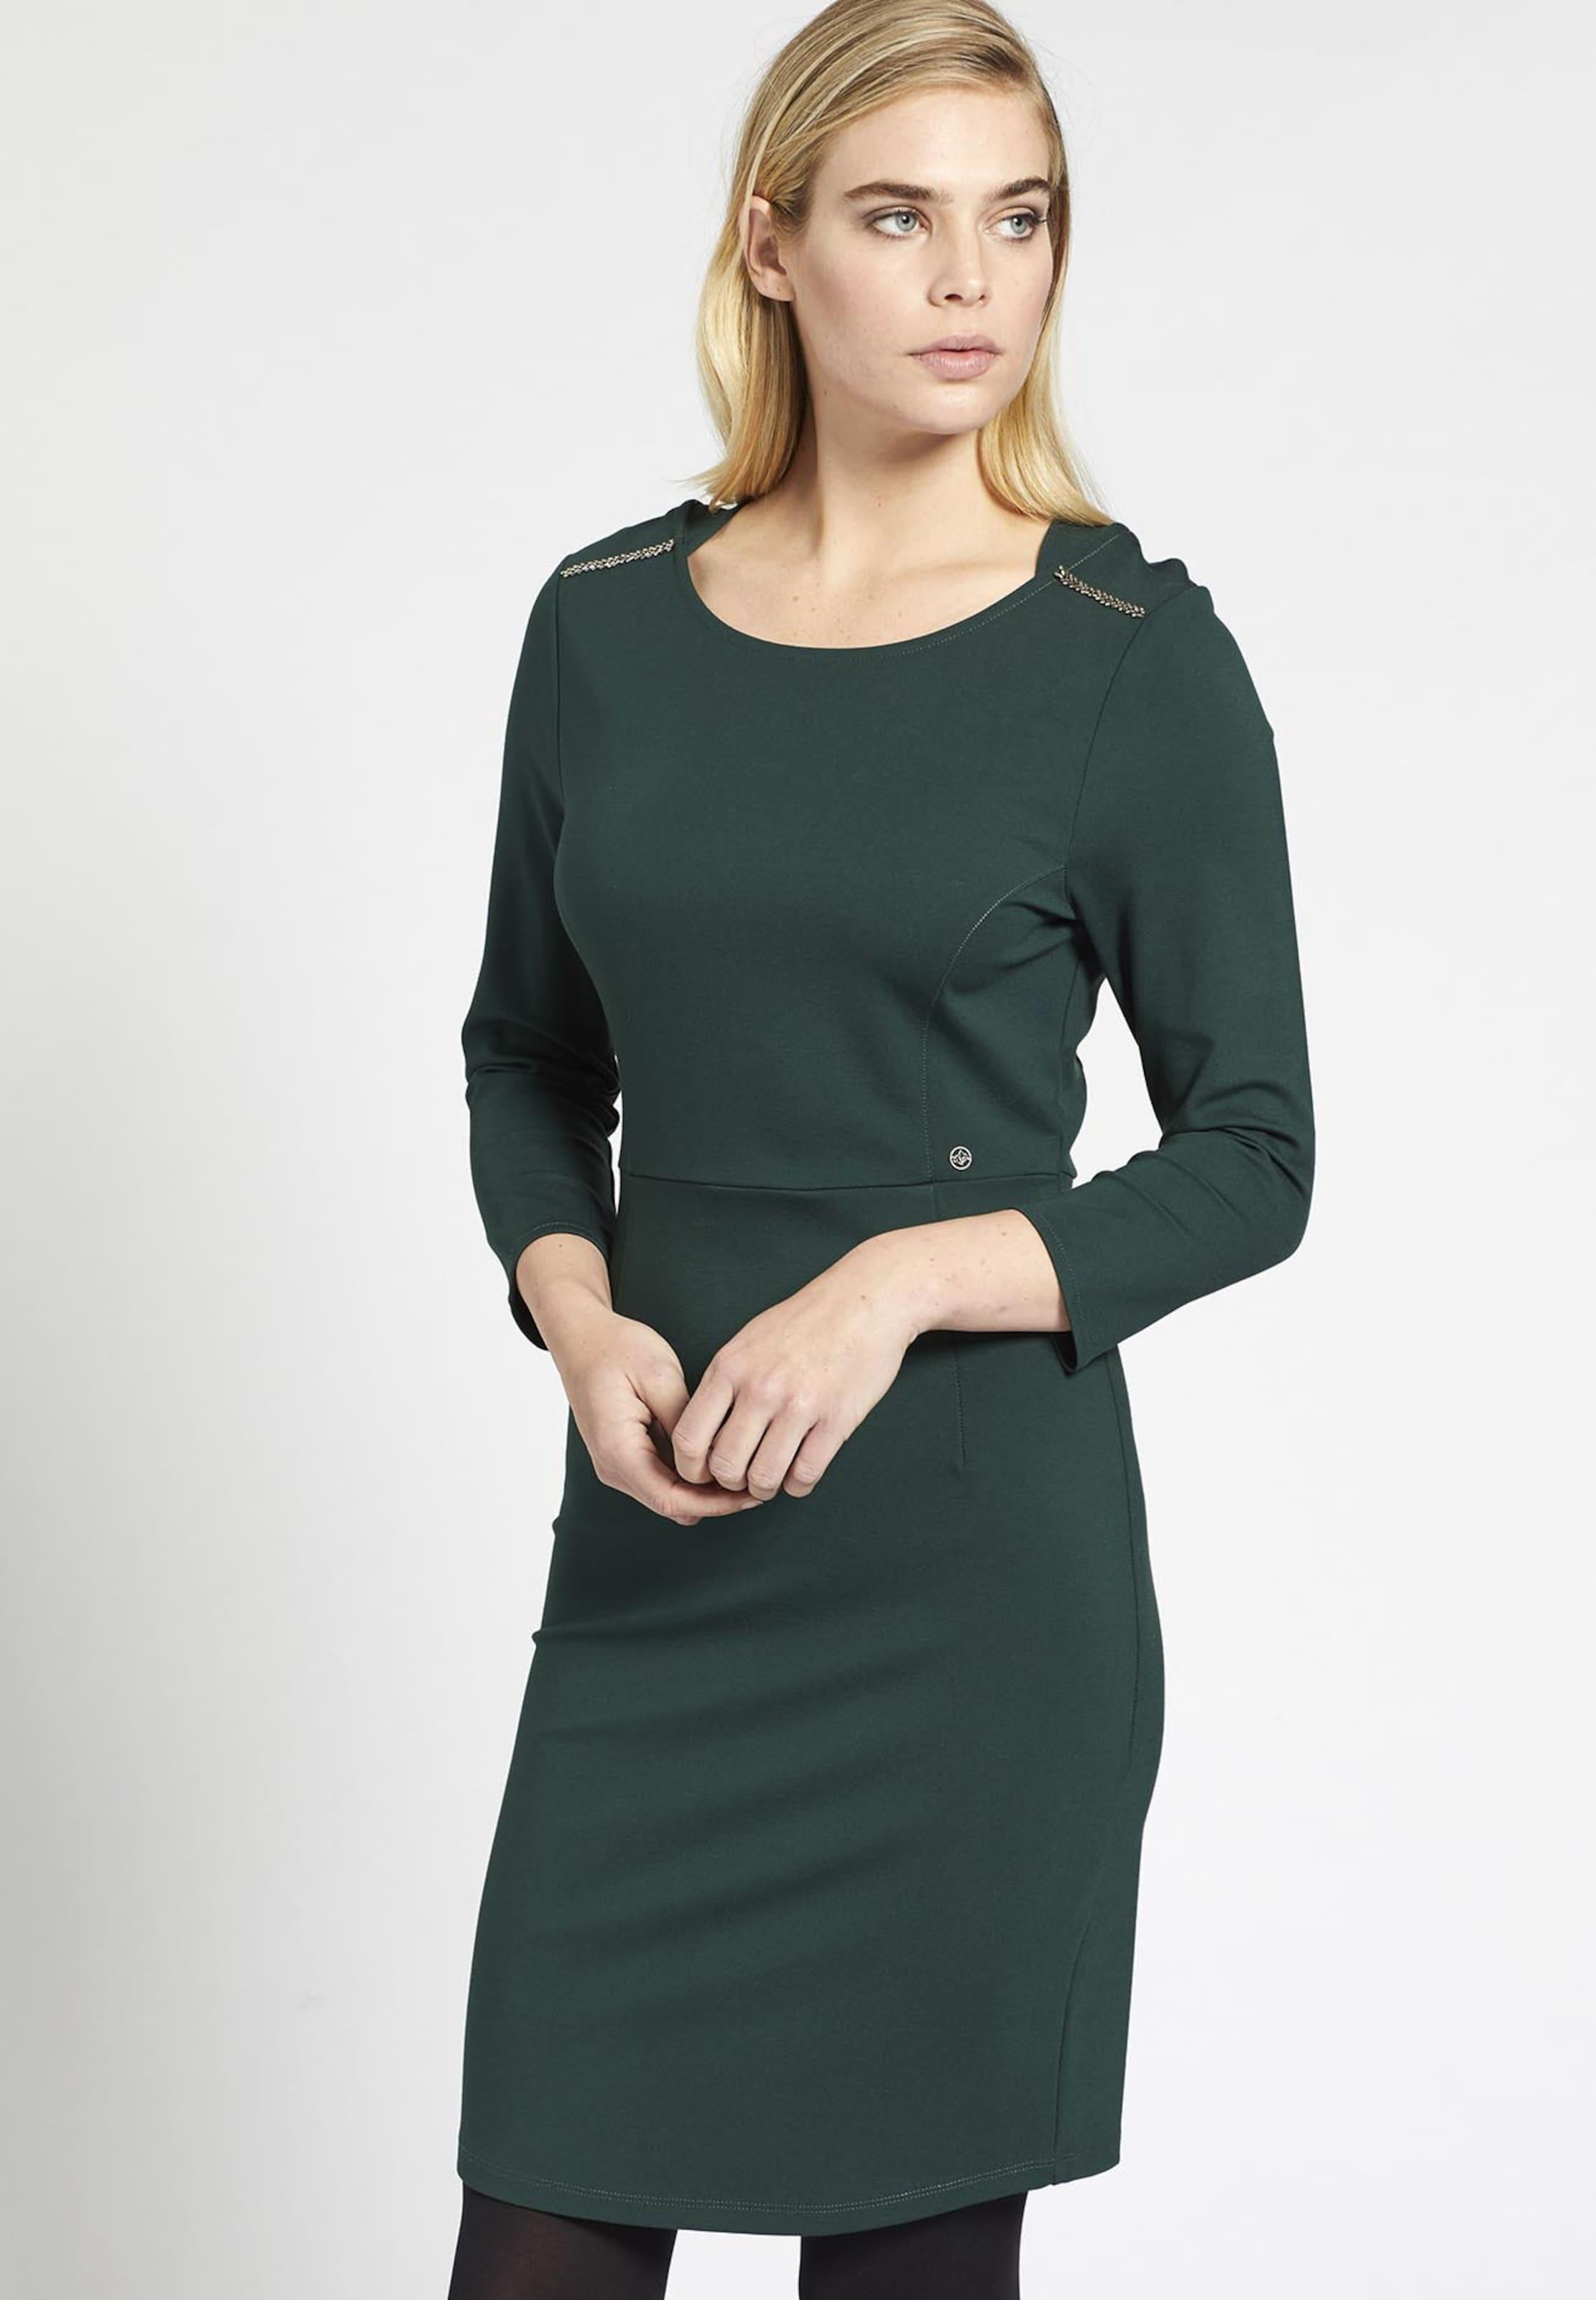 Vert Khujo 'carmina' En Vert Robe 'carmina' 'carmina' Khujo En Robe Robe Khujo nvN0m8w